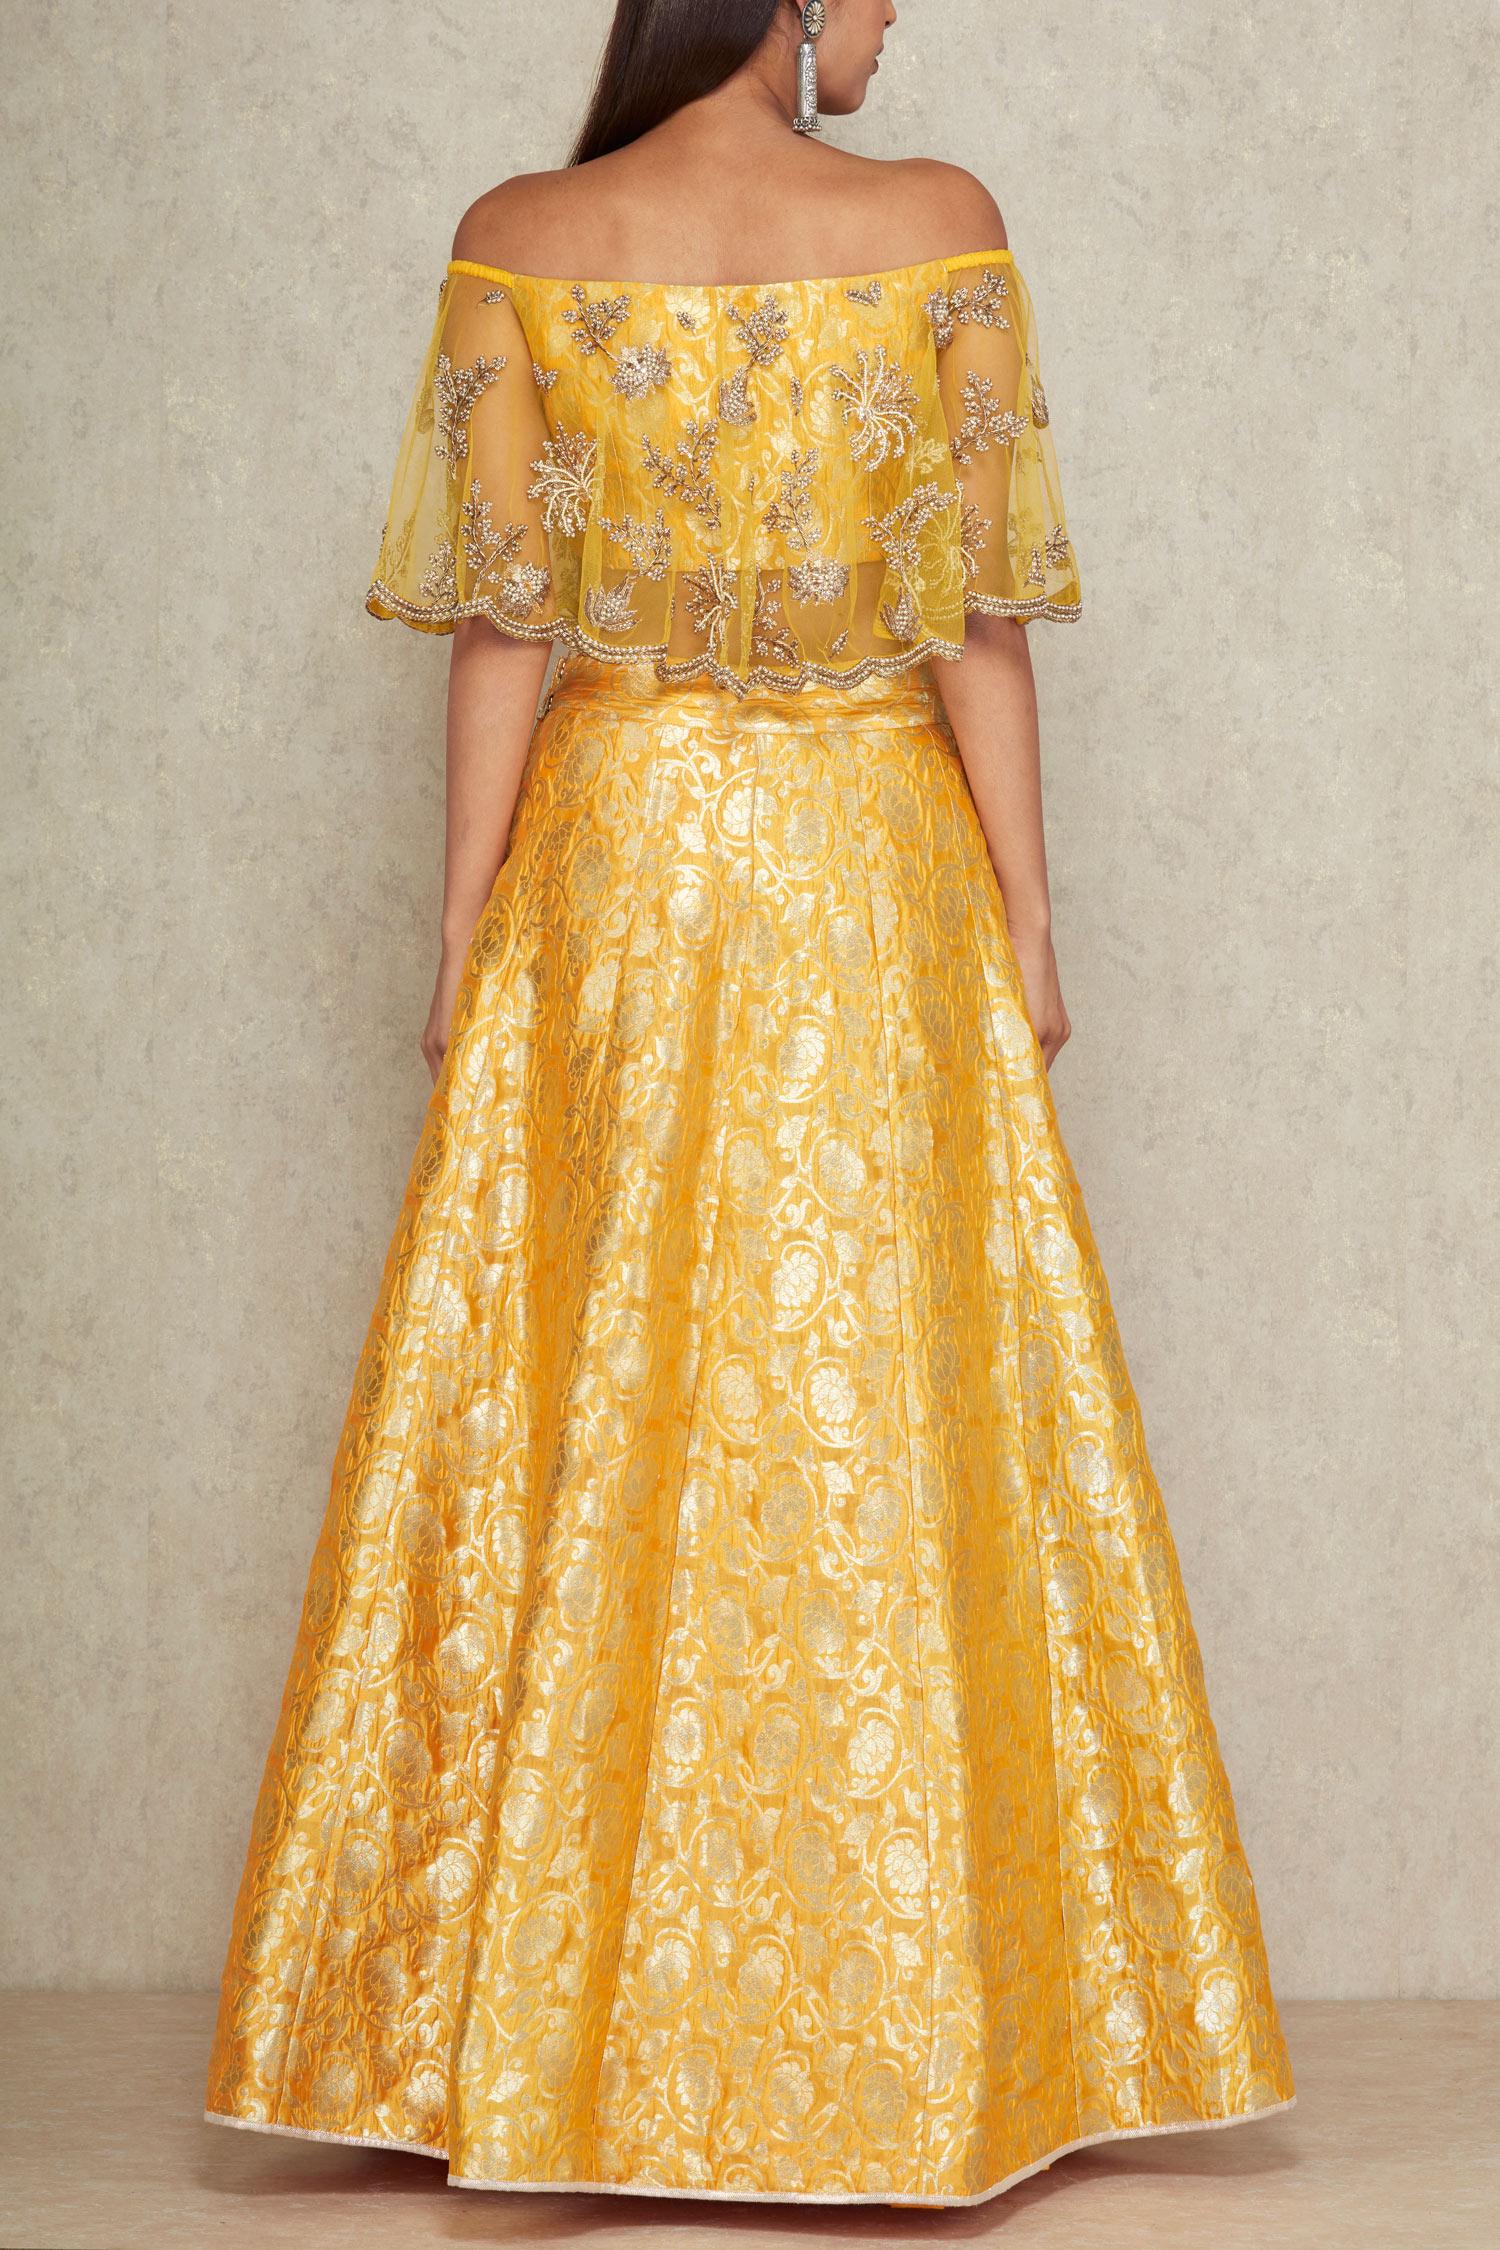 352be7bf770 Off shoulder blouse and lehenga set - Payal Singhal - Designers - I ...